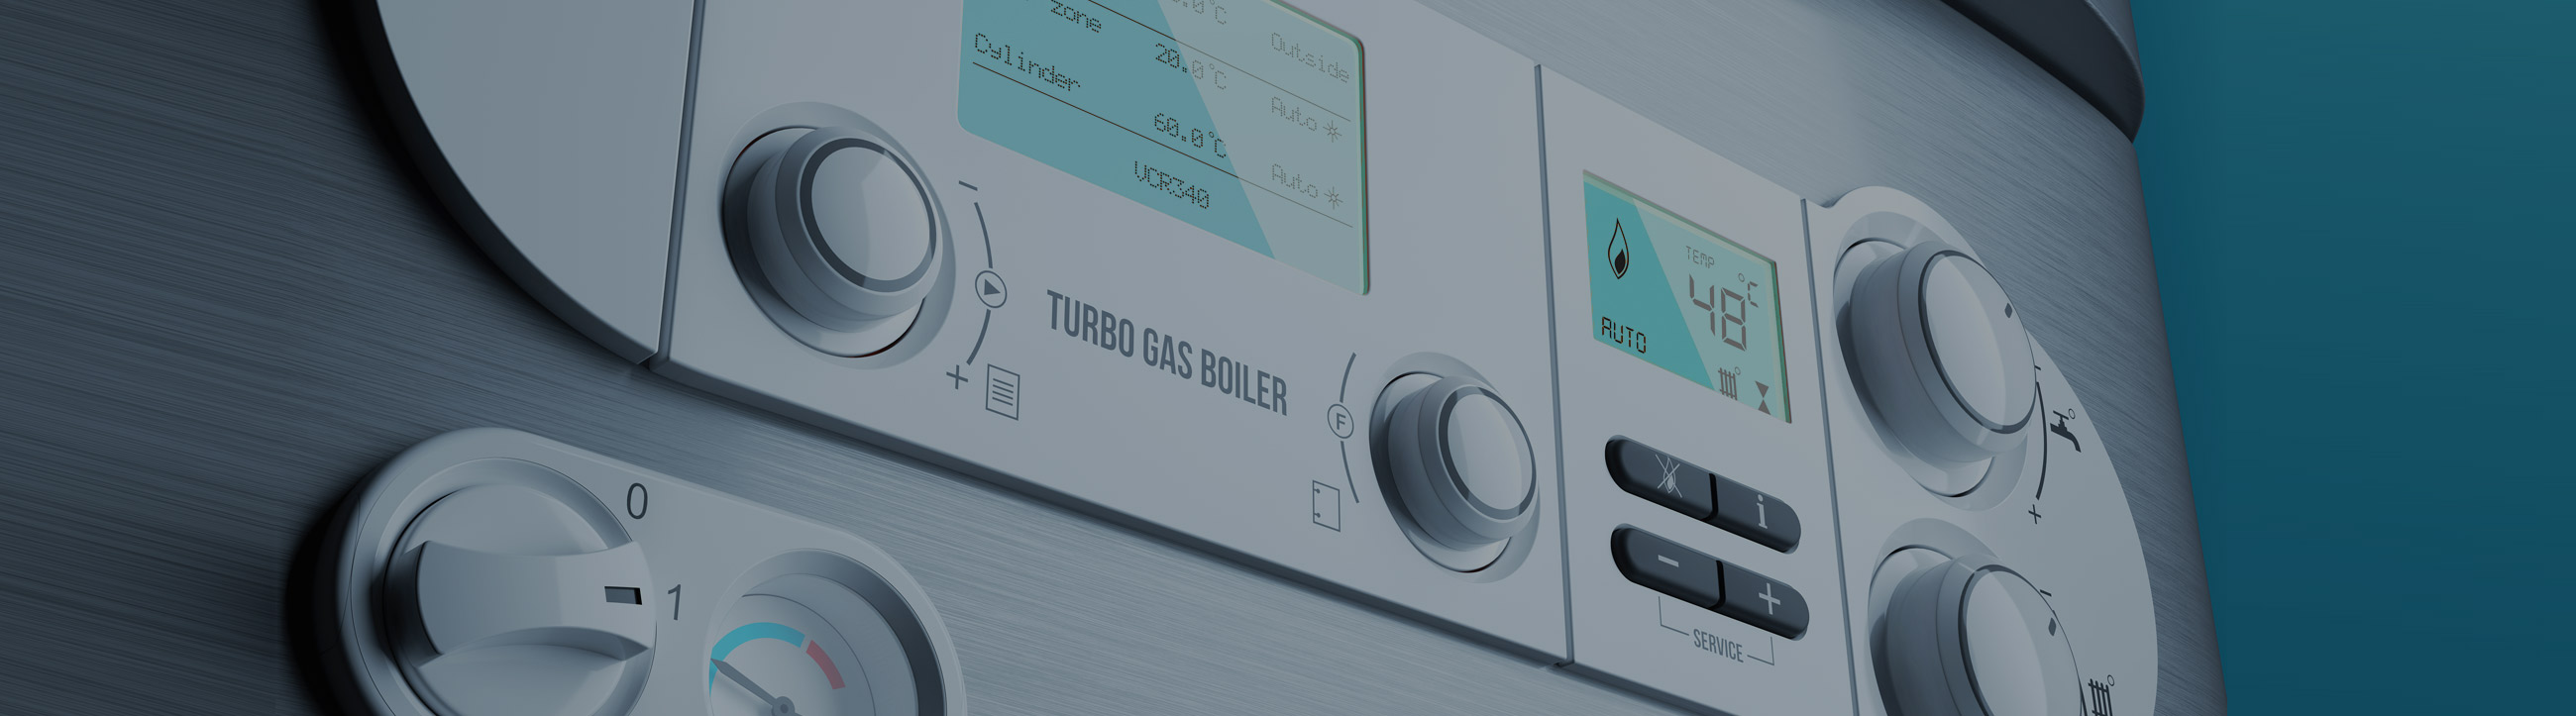 JD Heating & Plumbing Services LTD | Boiler Installations